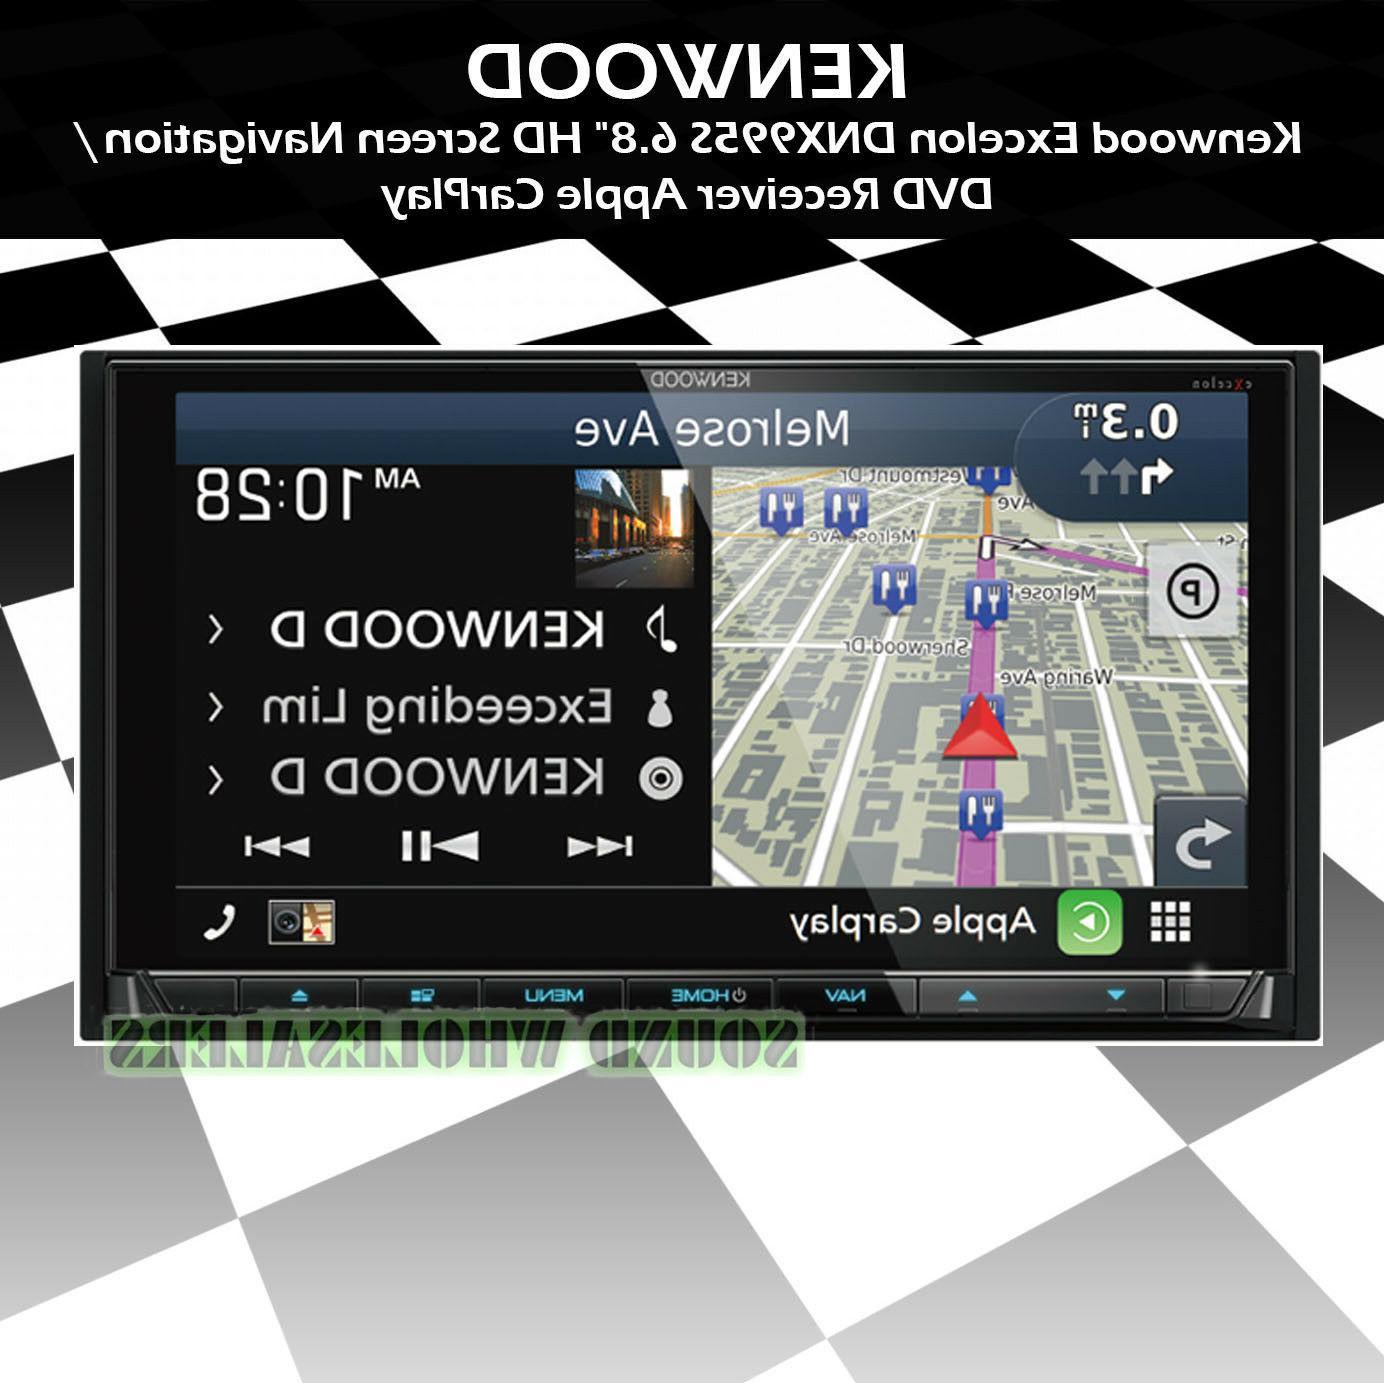 excelon dnx995s dash navigation system